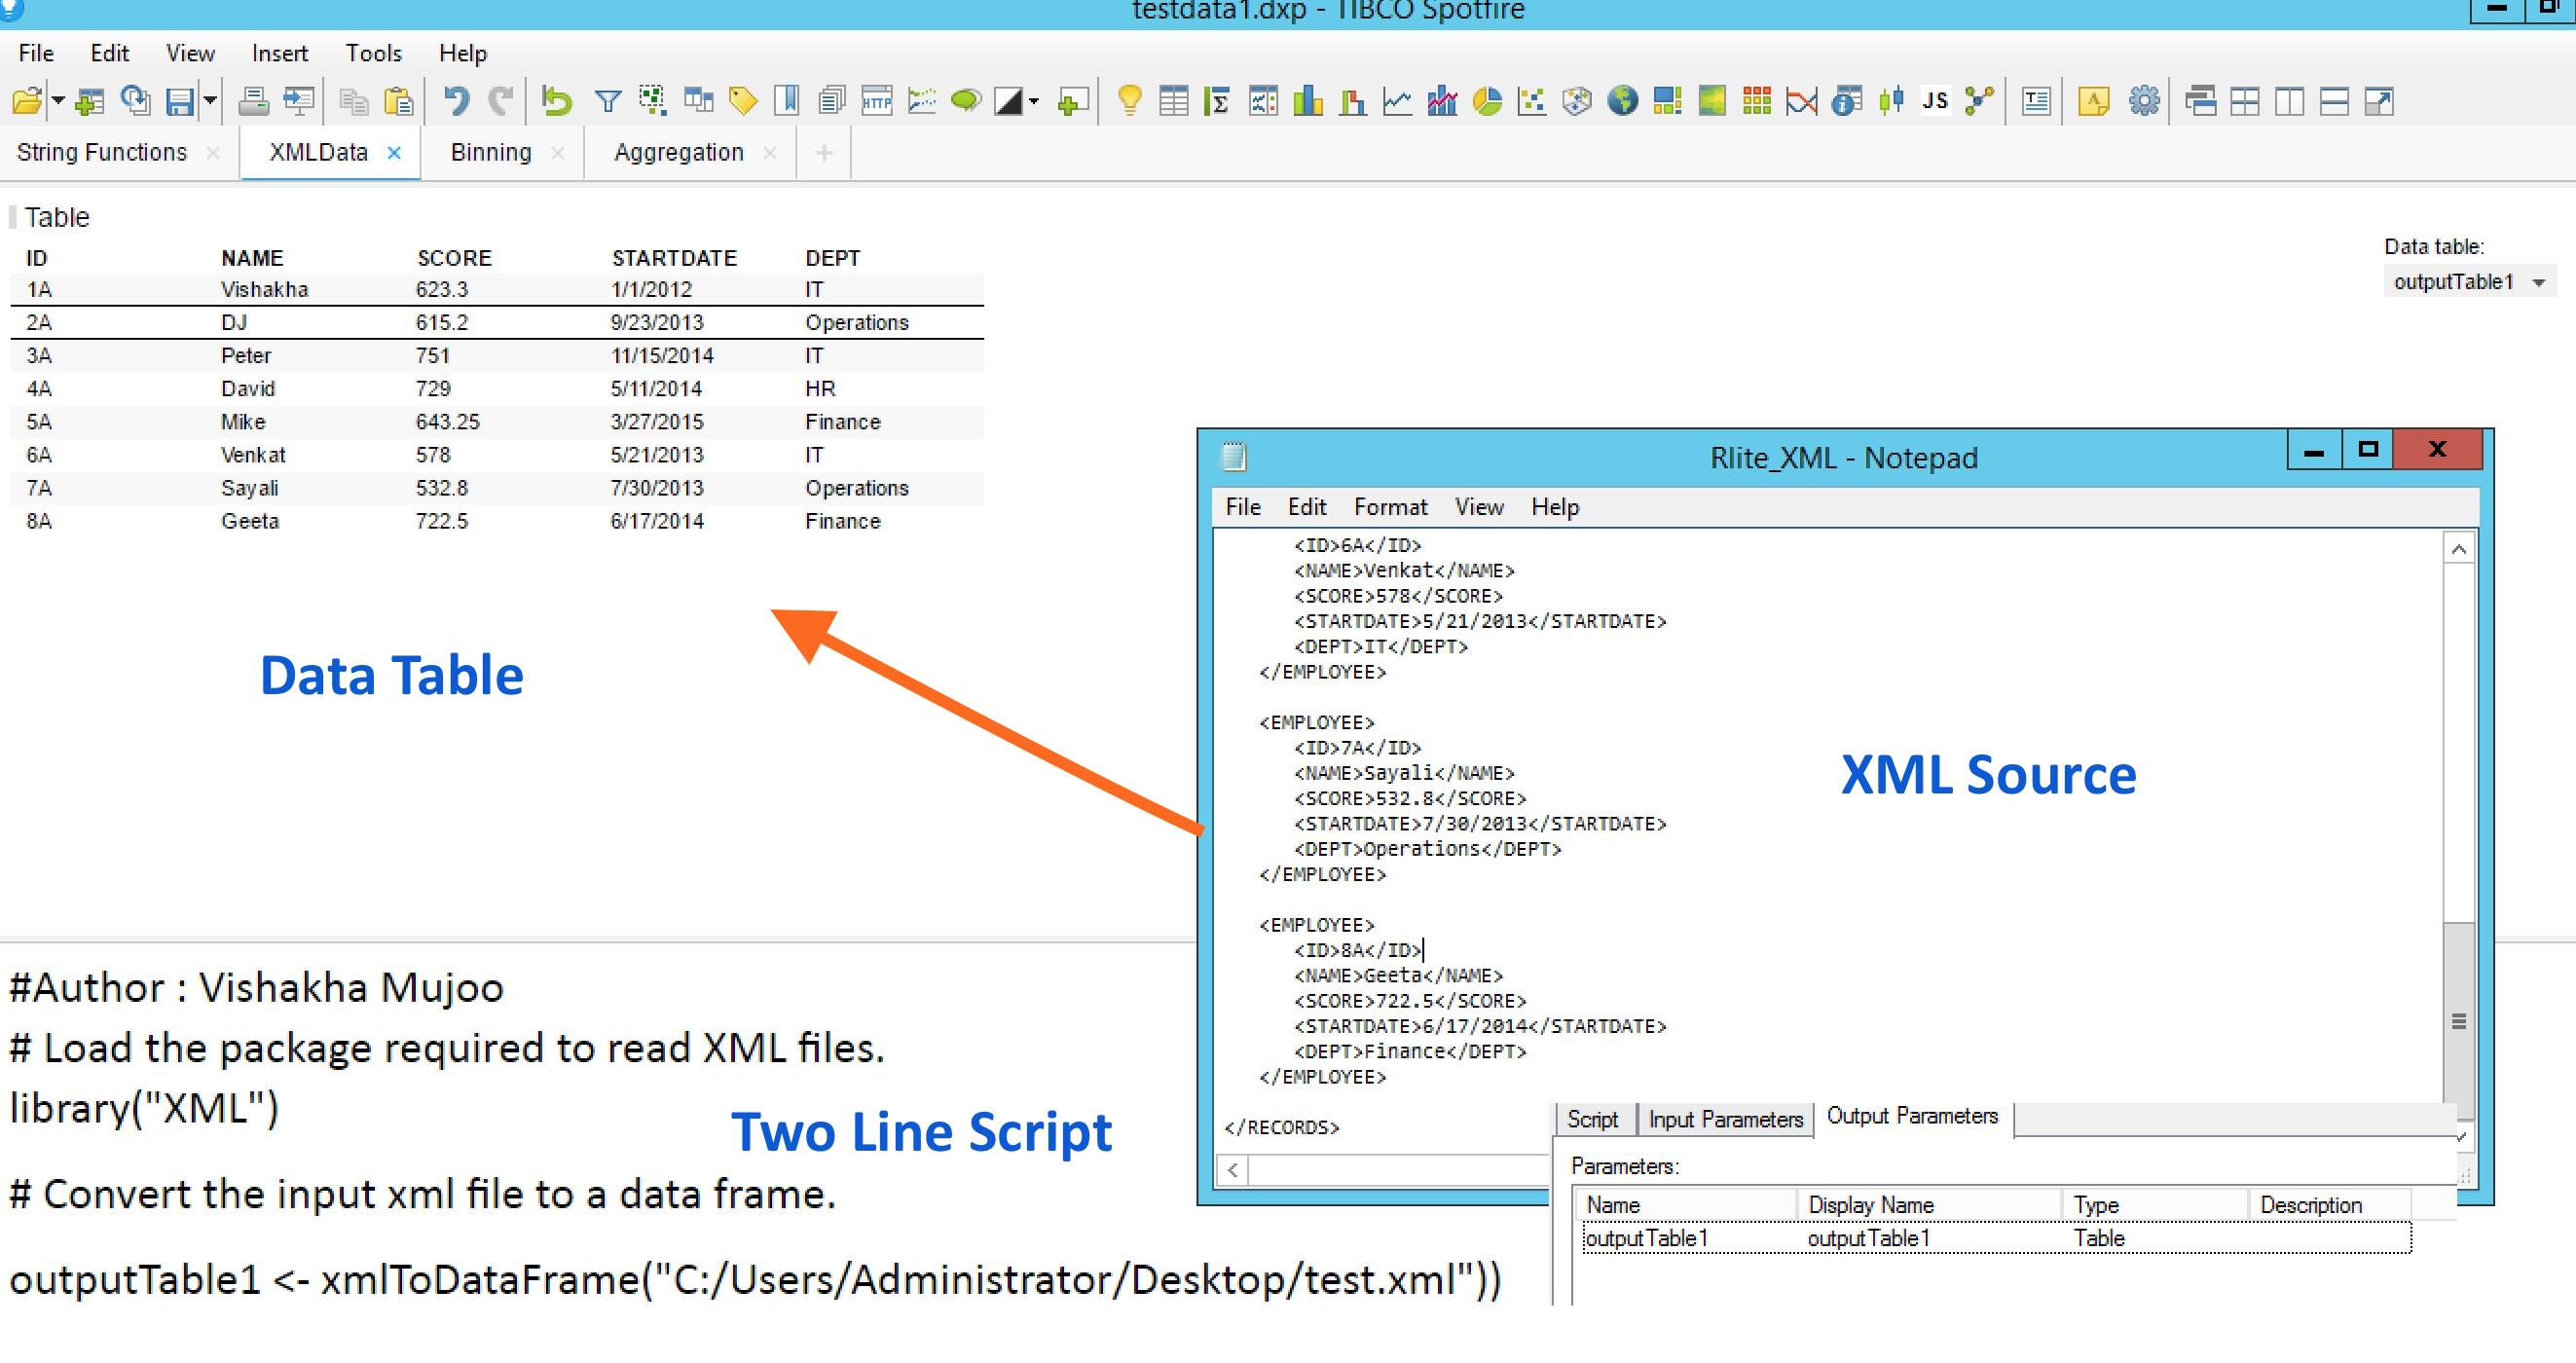 Loading XML Data into TIBCO Spotfire - BPI - The destination